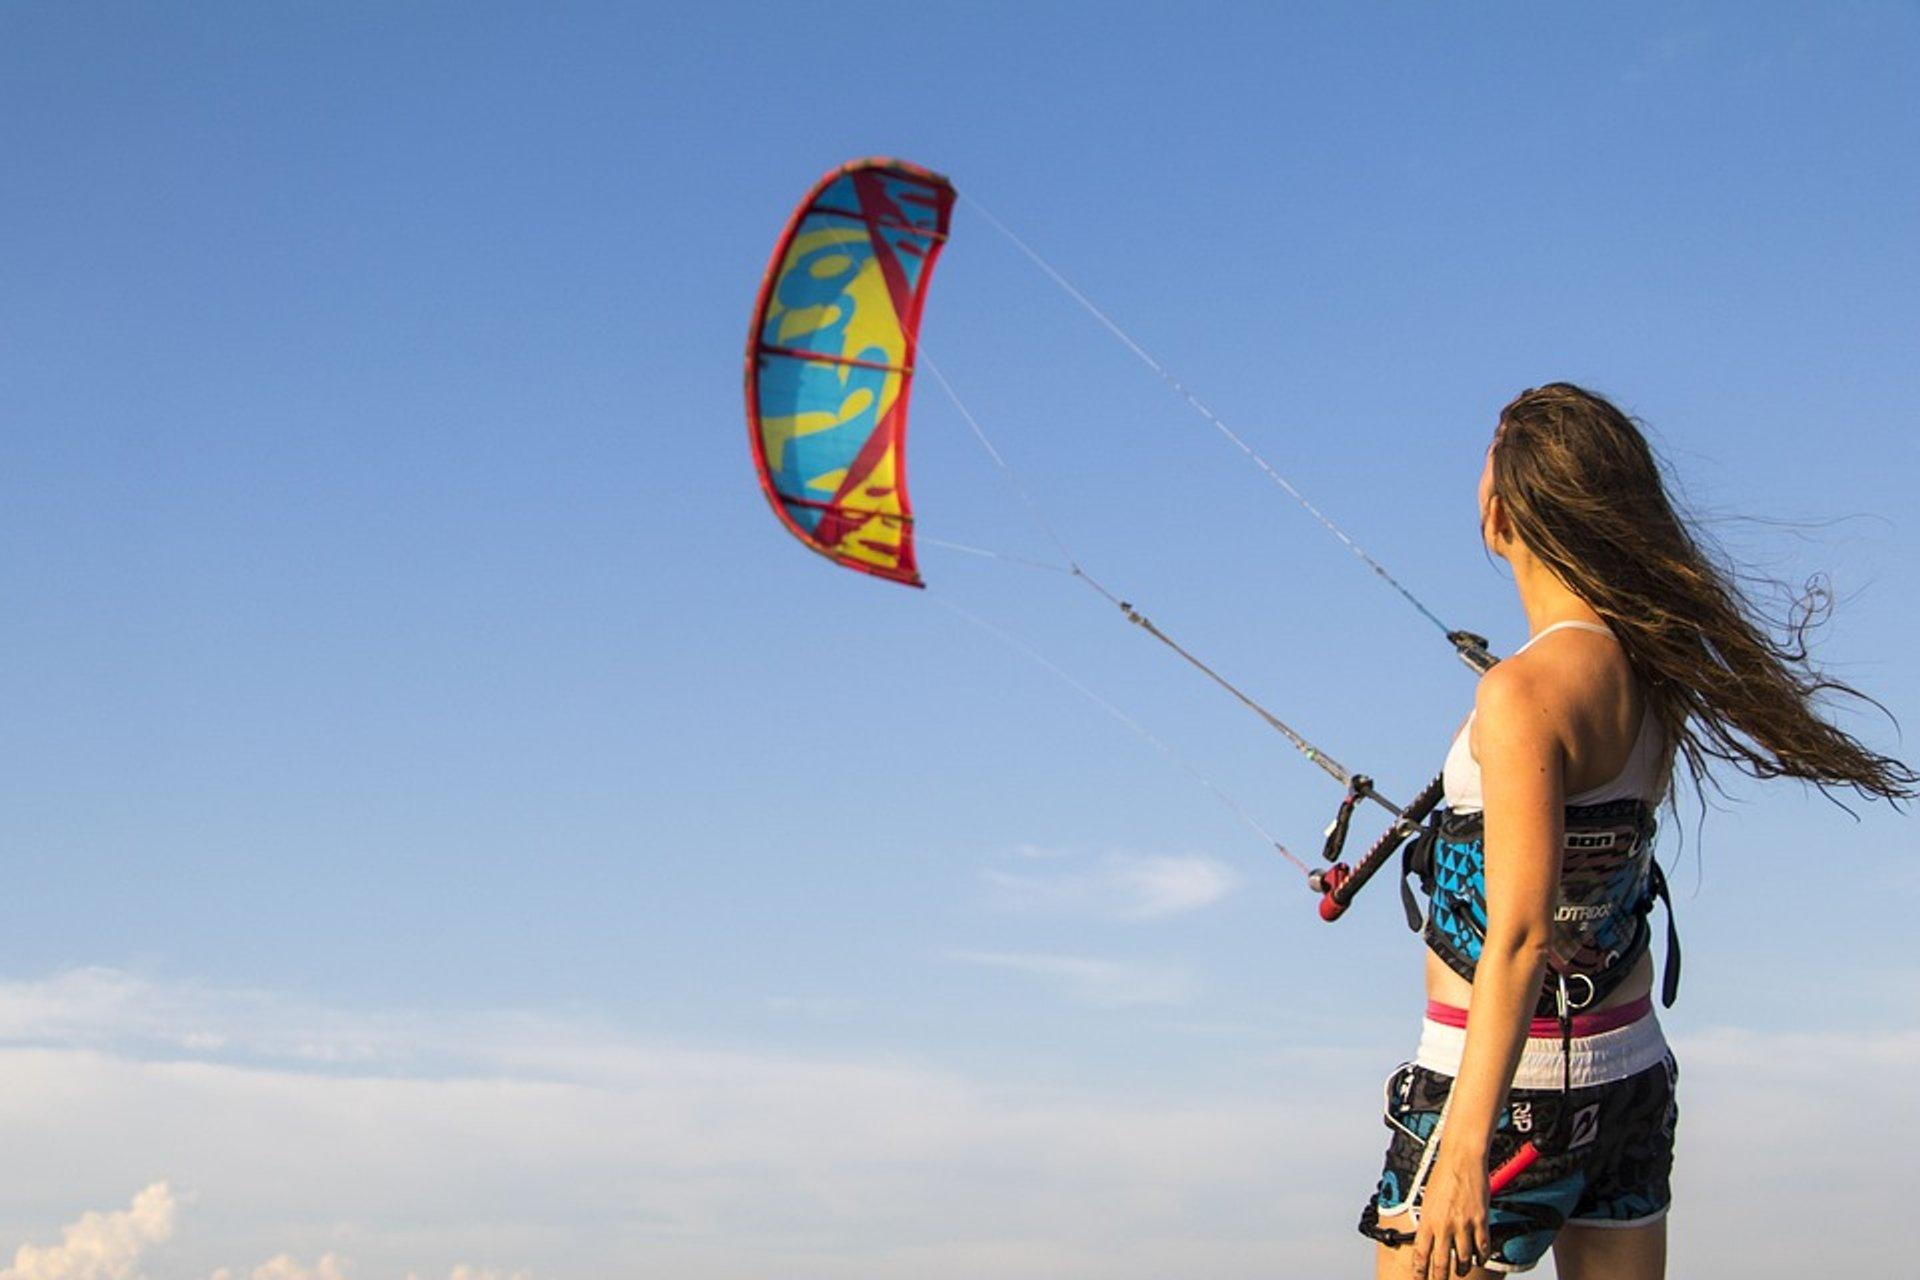 Kitesurfing in Montenegro 2020 - Best Time